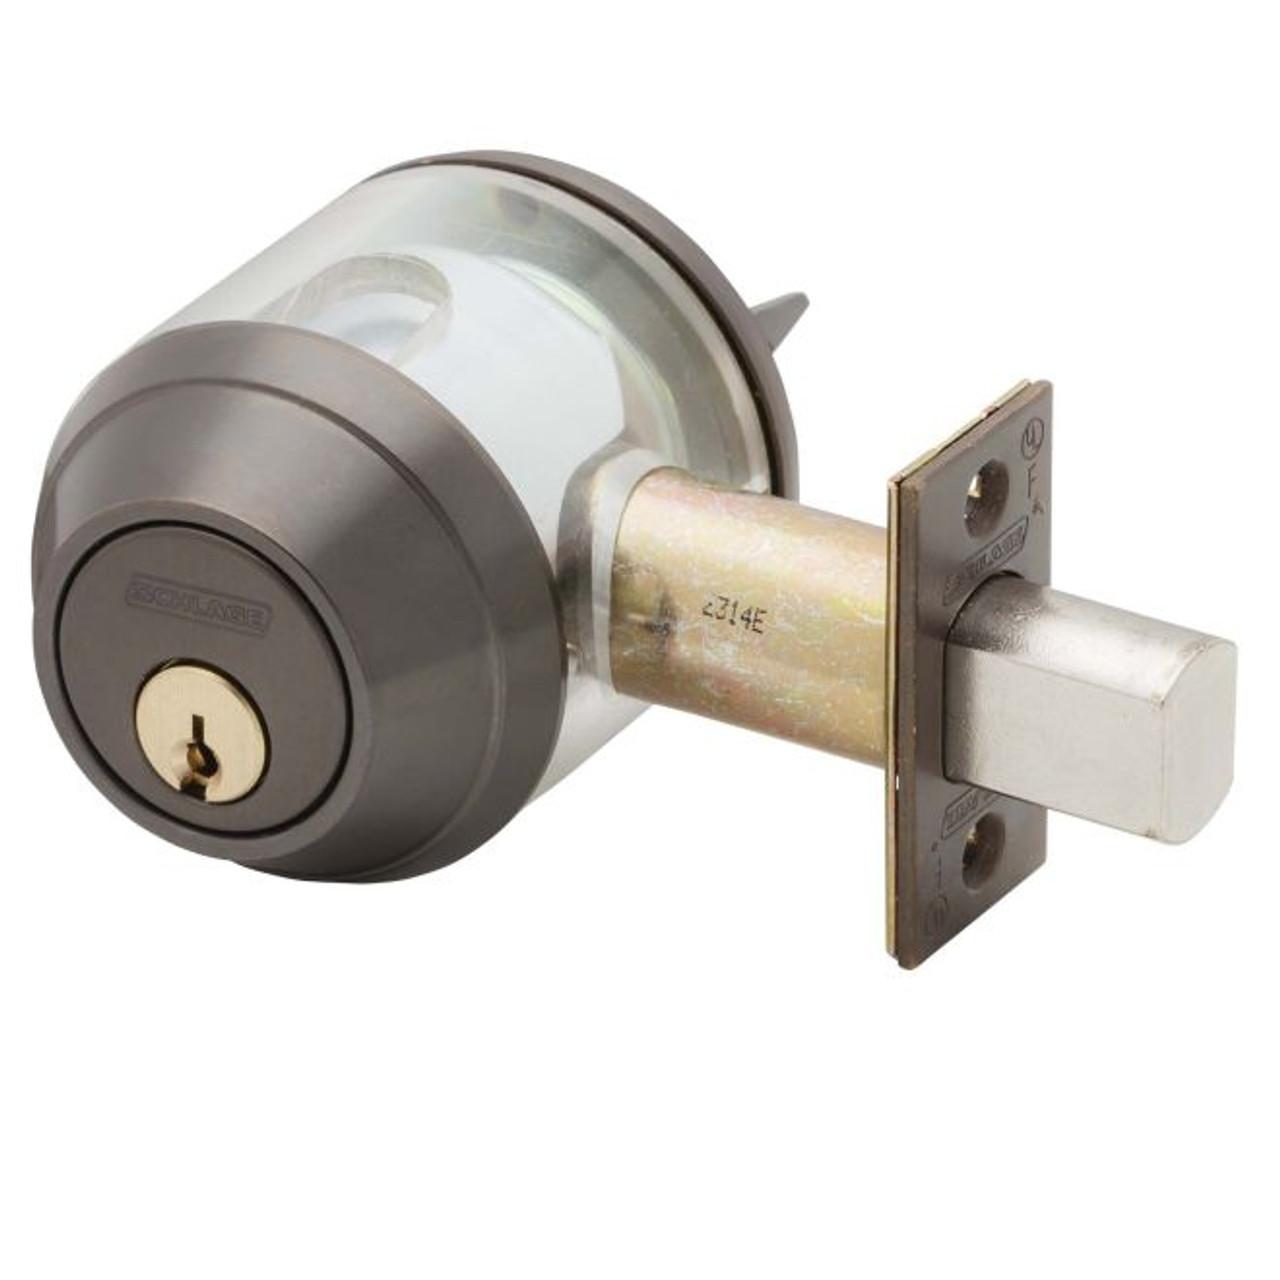 Schlage Double Cylinder deadbolt Lock B662J 643e Aged Bronze